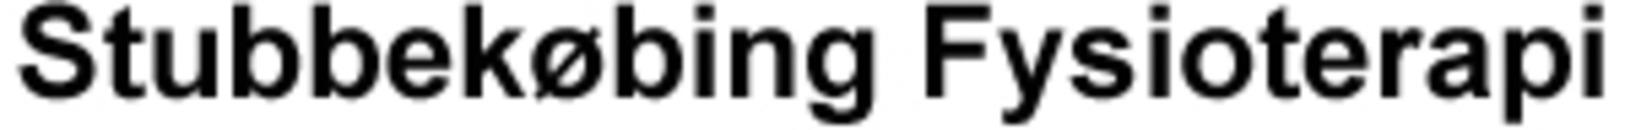 Stubbekøbing Fysioterapi logo